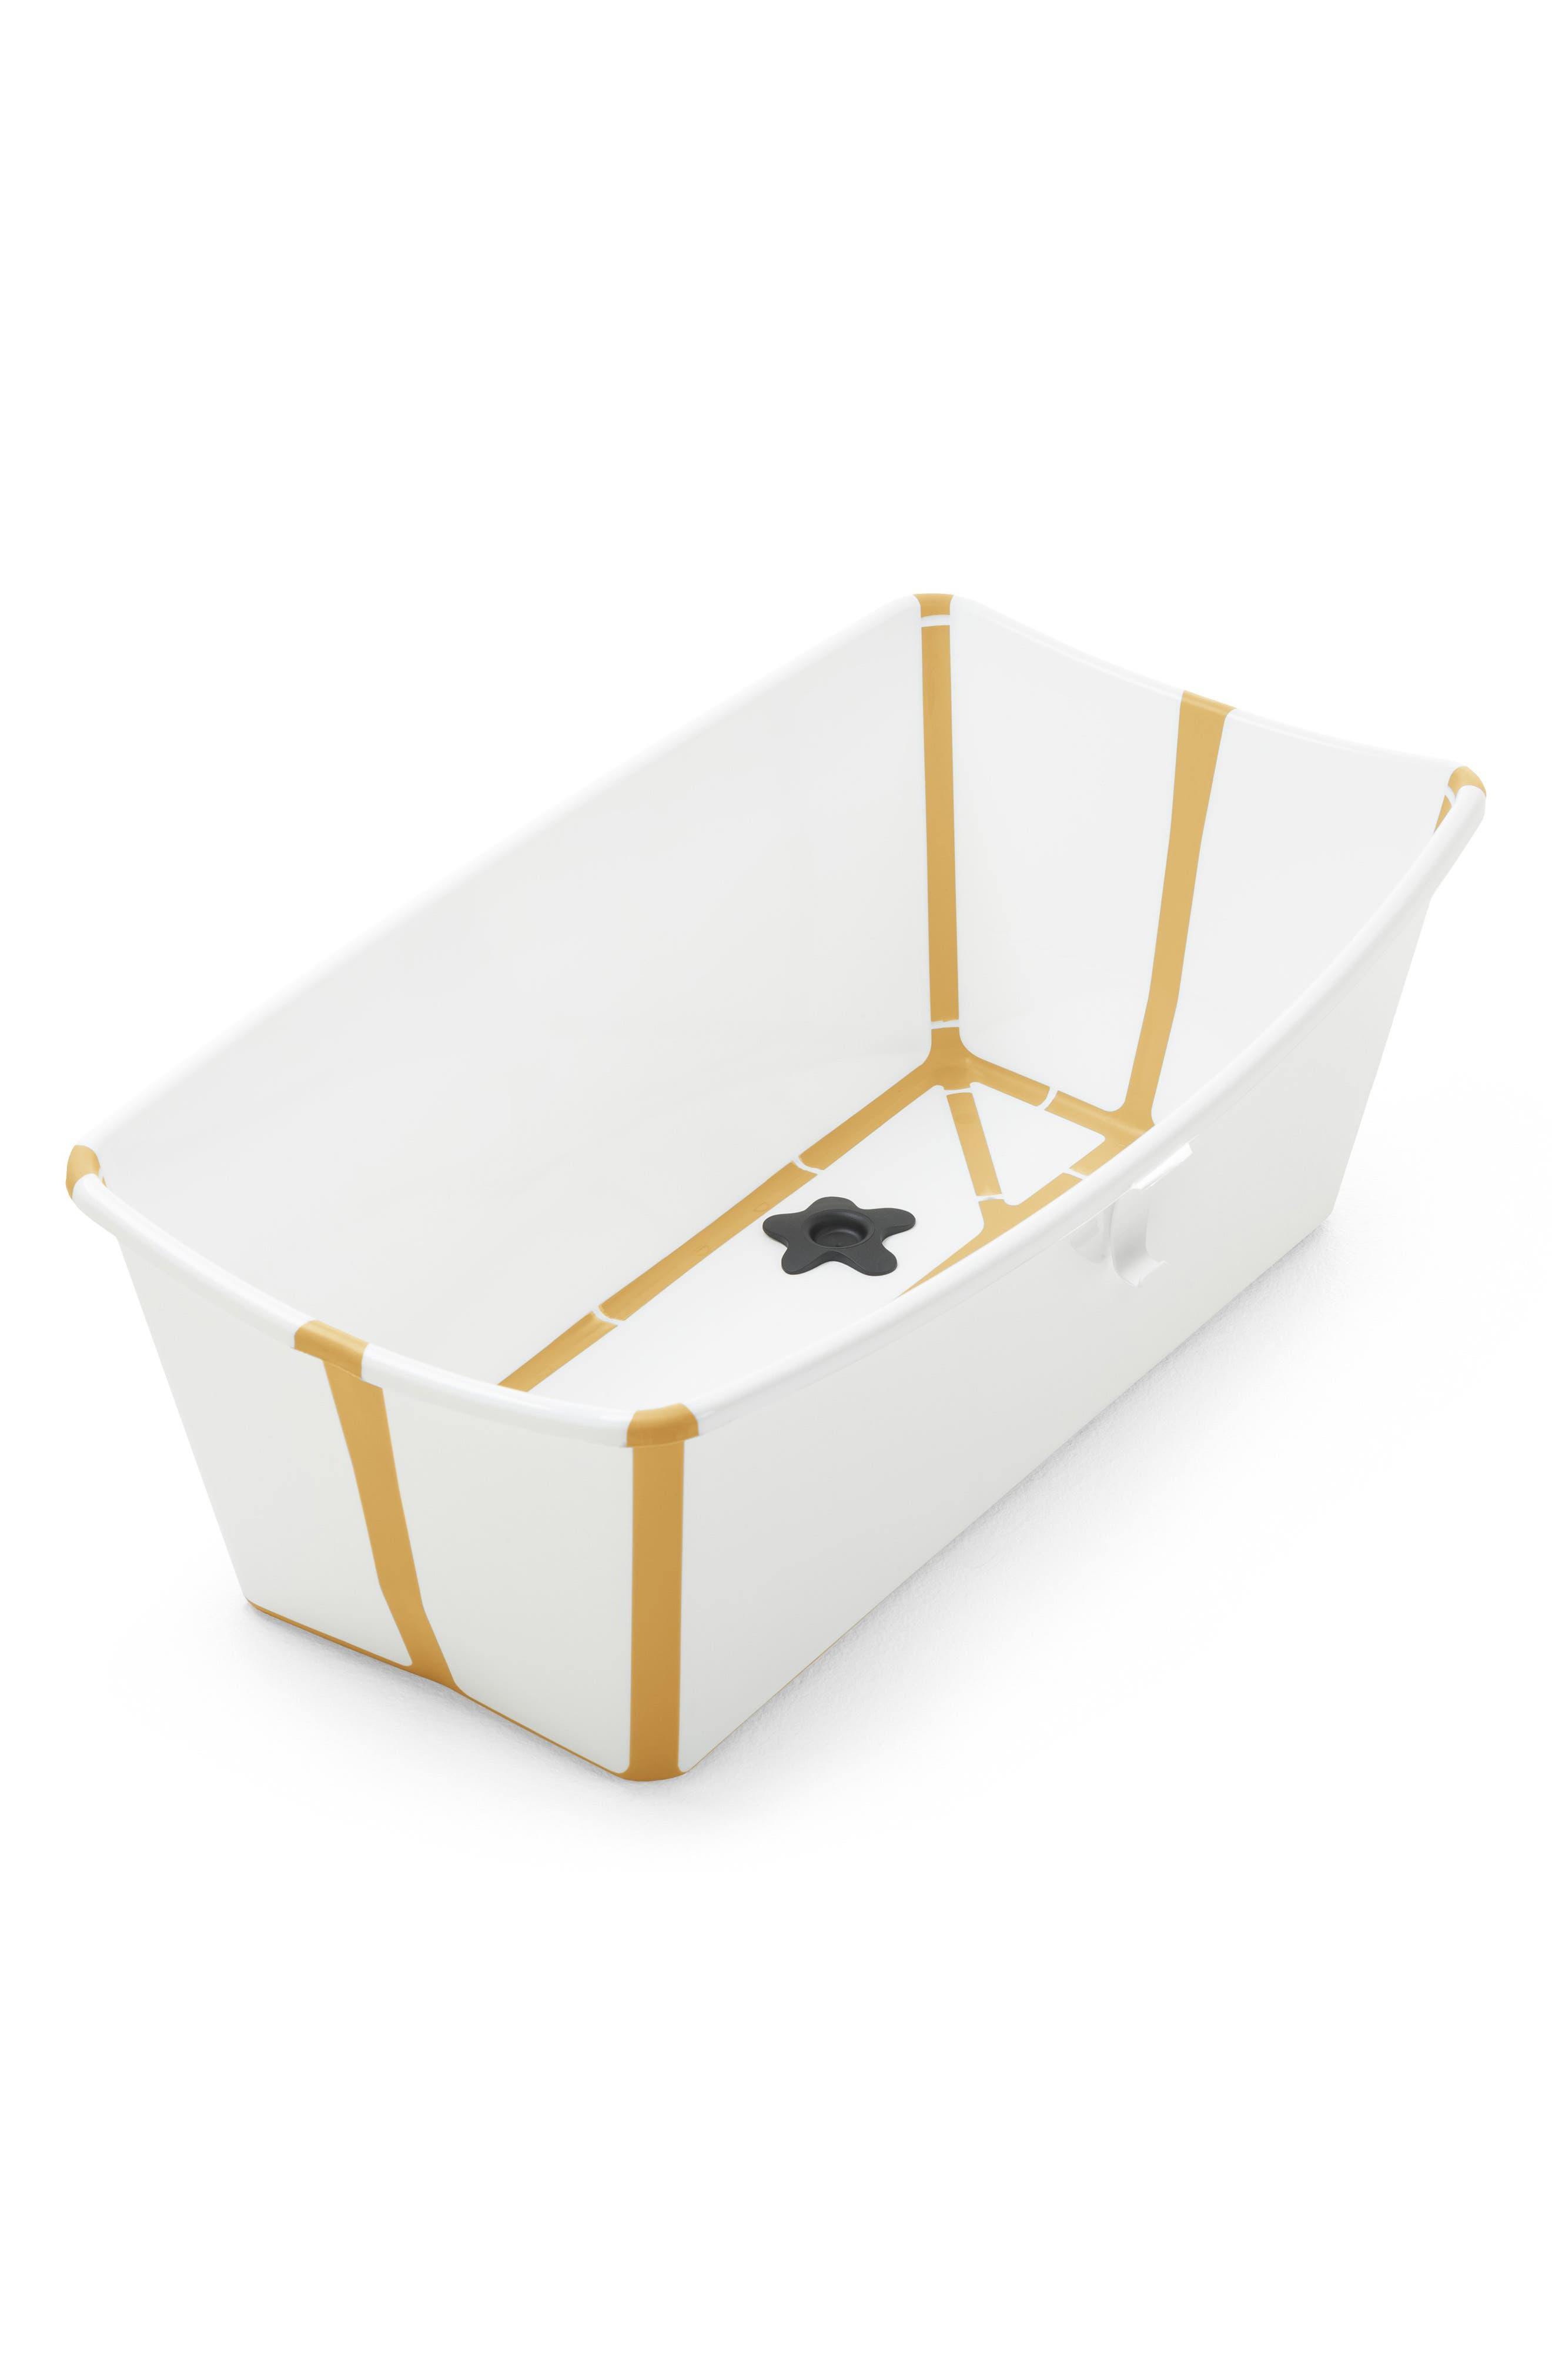 Infant Stokke Flexi Bath Foldable Baby Bathtub With Temperature Plug, Size One Size - Yellow